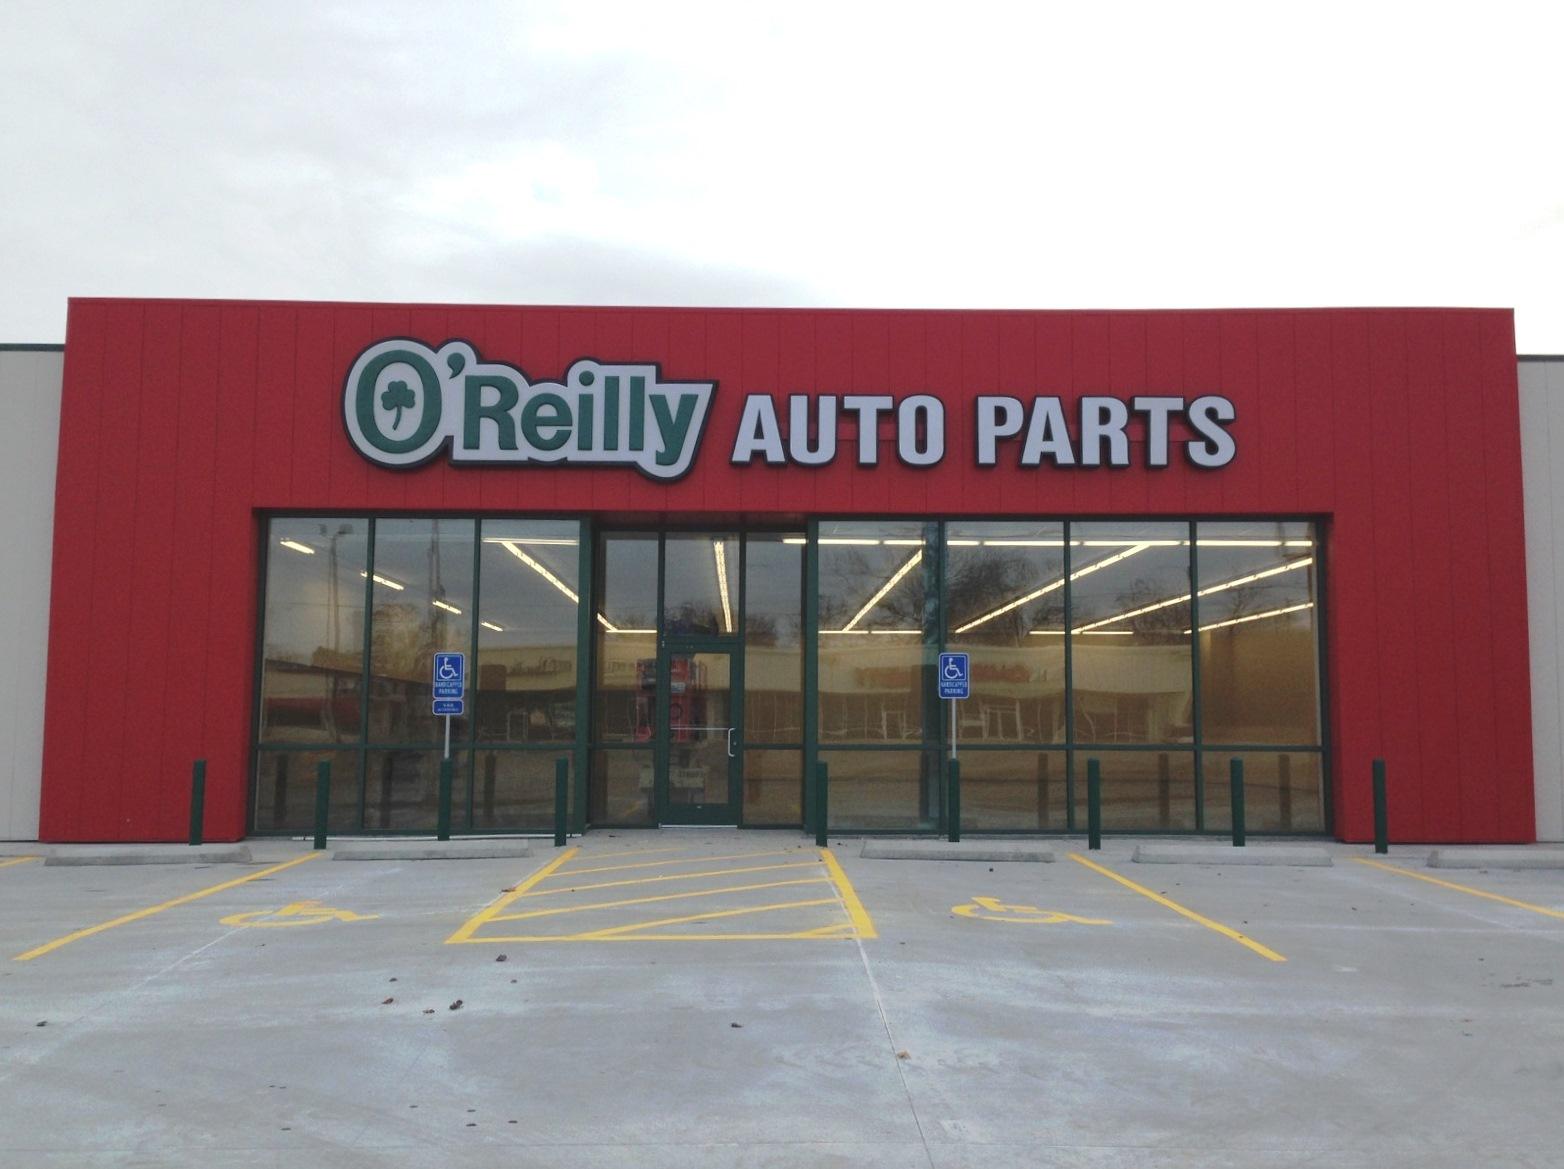 o'reilly auto parts - photo #41